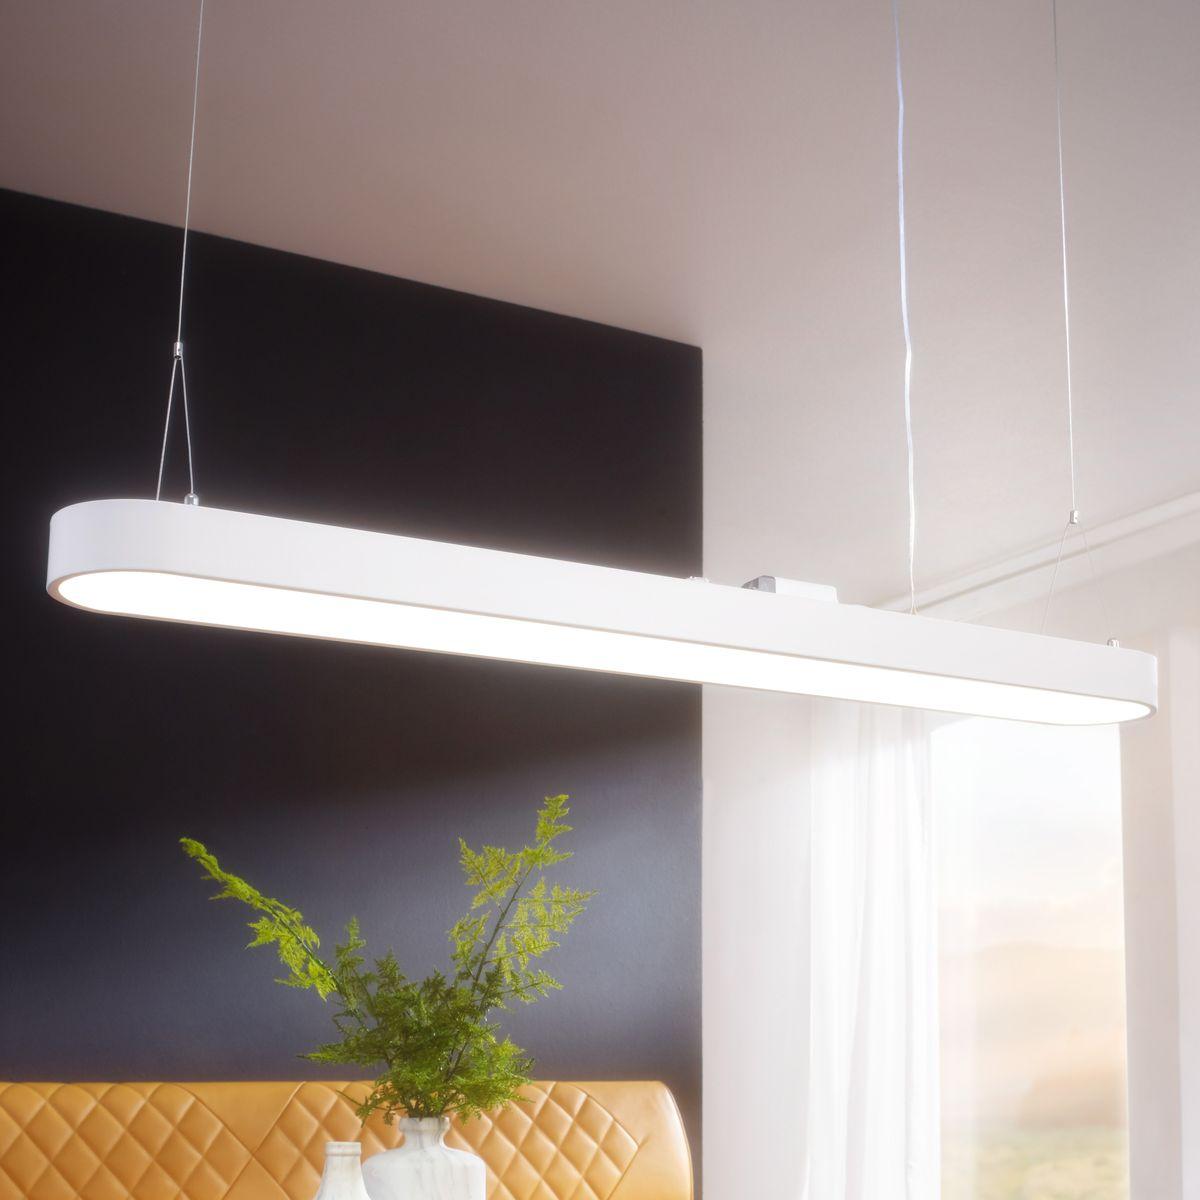 finebuy led deckenleuchte cord metall eek a b ro deckenlampe 48 watt 120 x 121 x 15 cm design. Black Bedroom Furniture Sets. Home Design Ideas